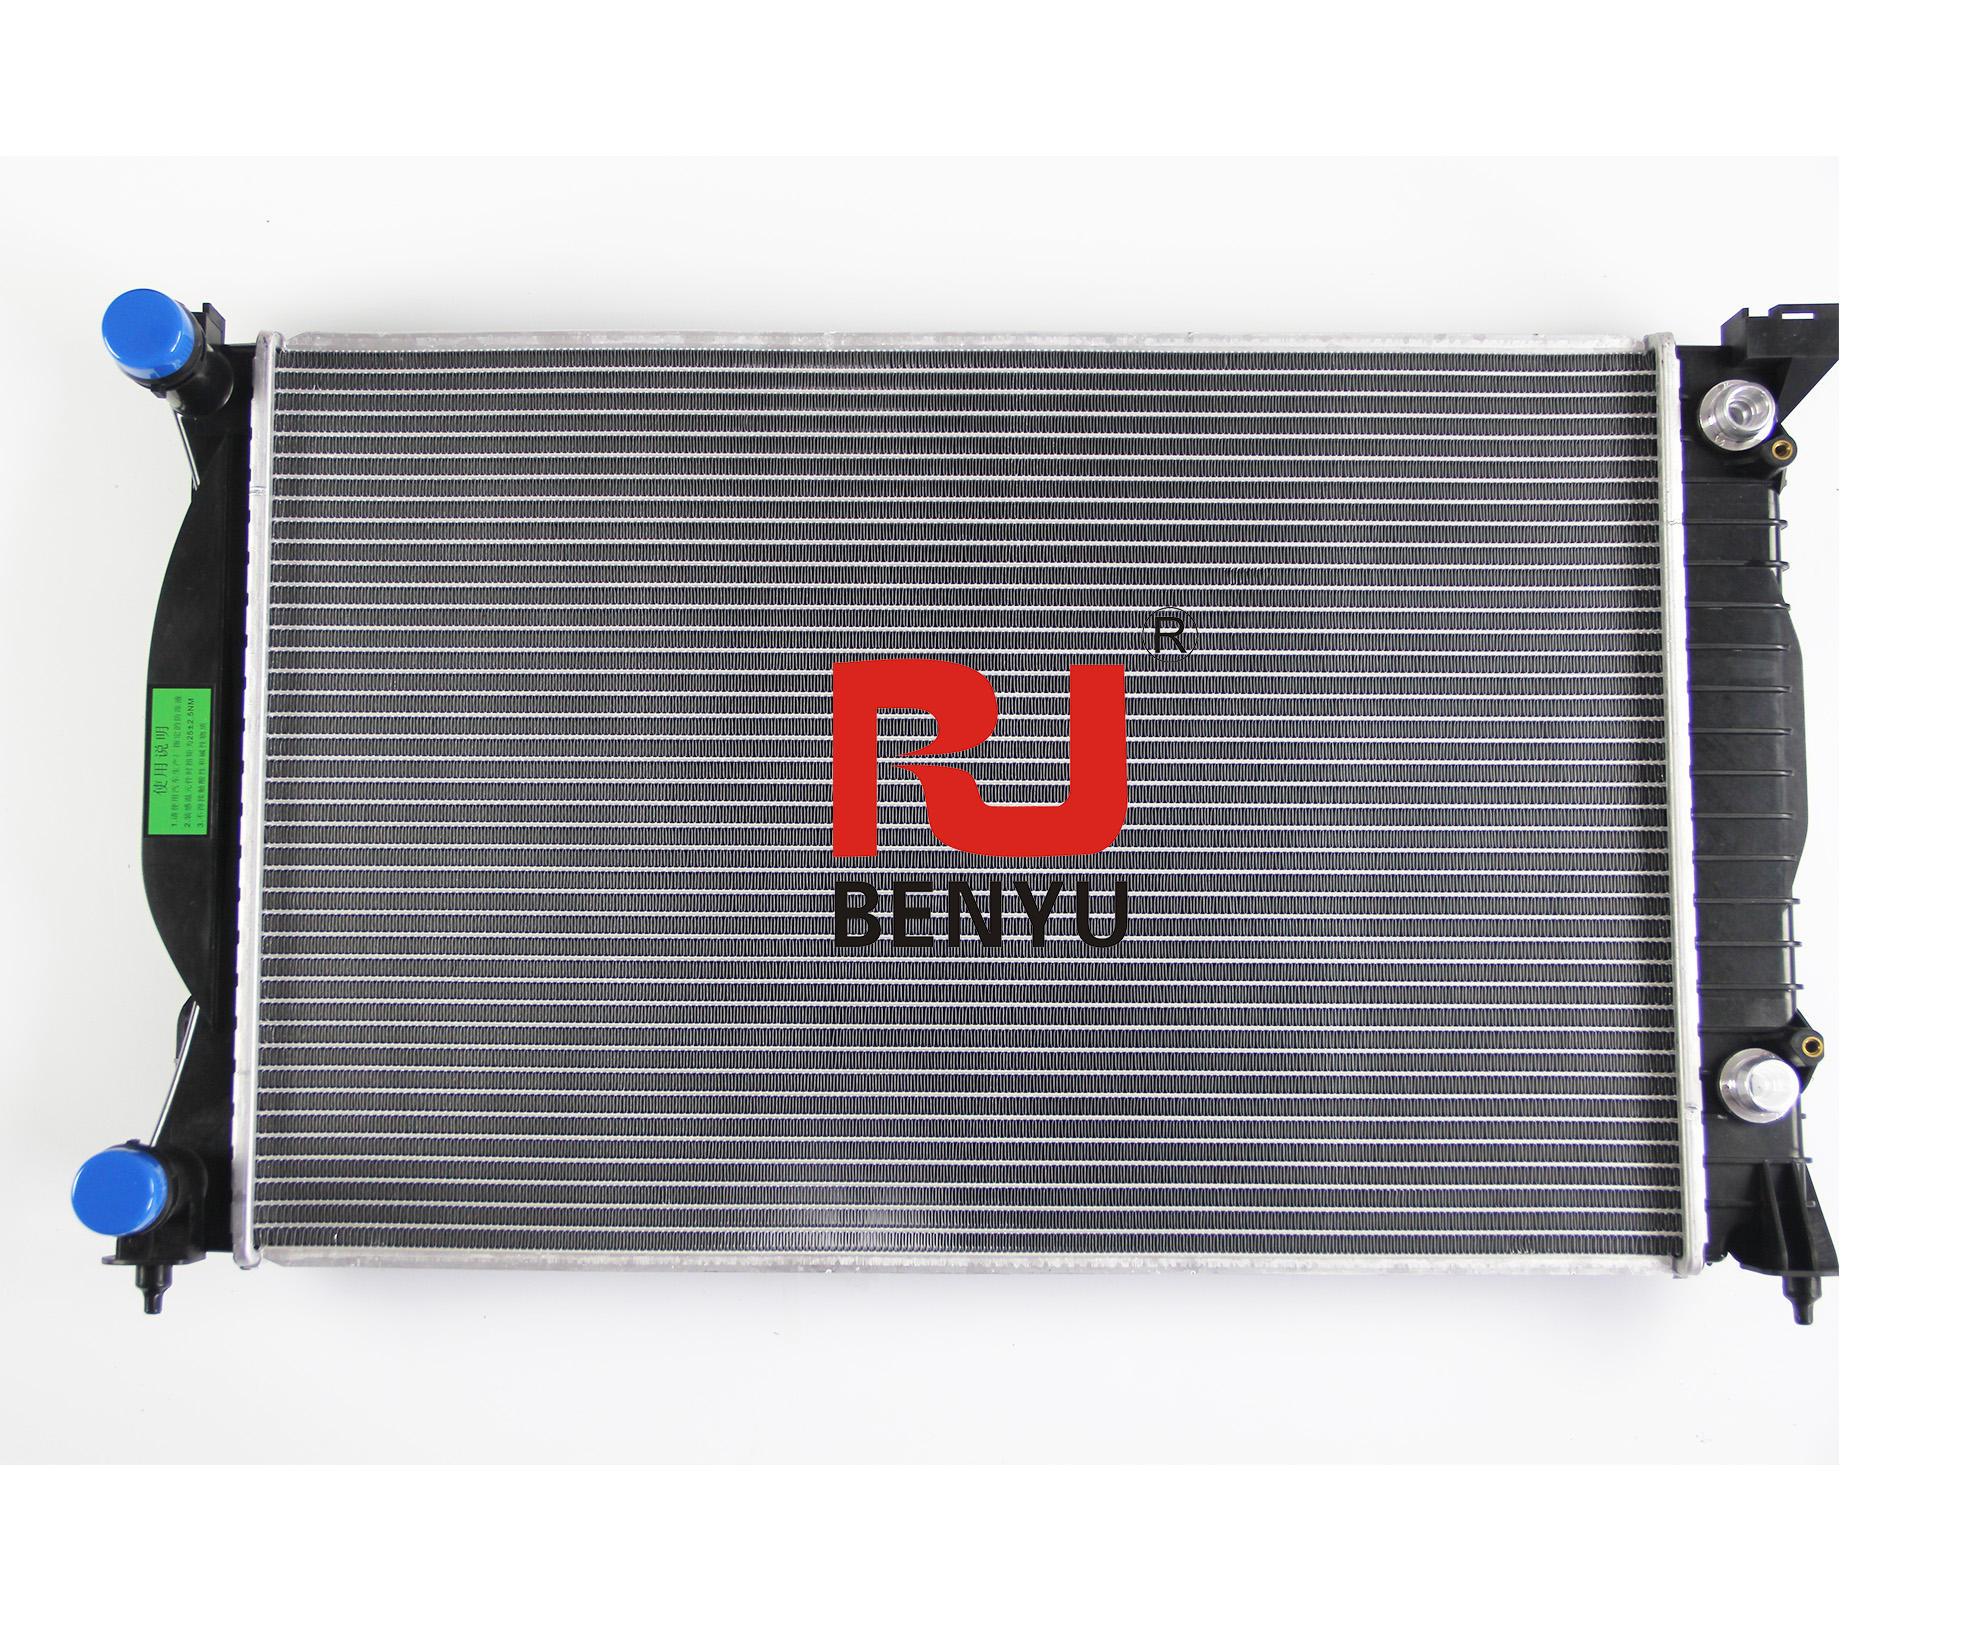 AT Radiator Fits Audi A4 A6 Quattro S4 VW Passat 98-05 Automatic Transmission